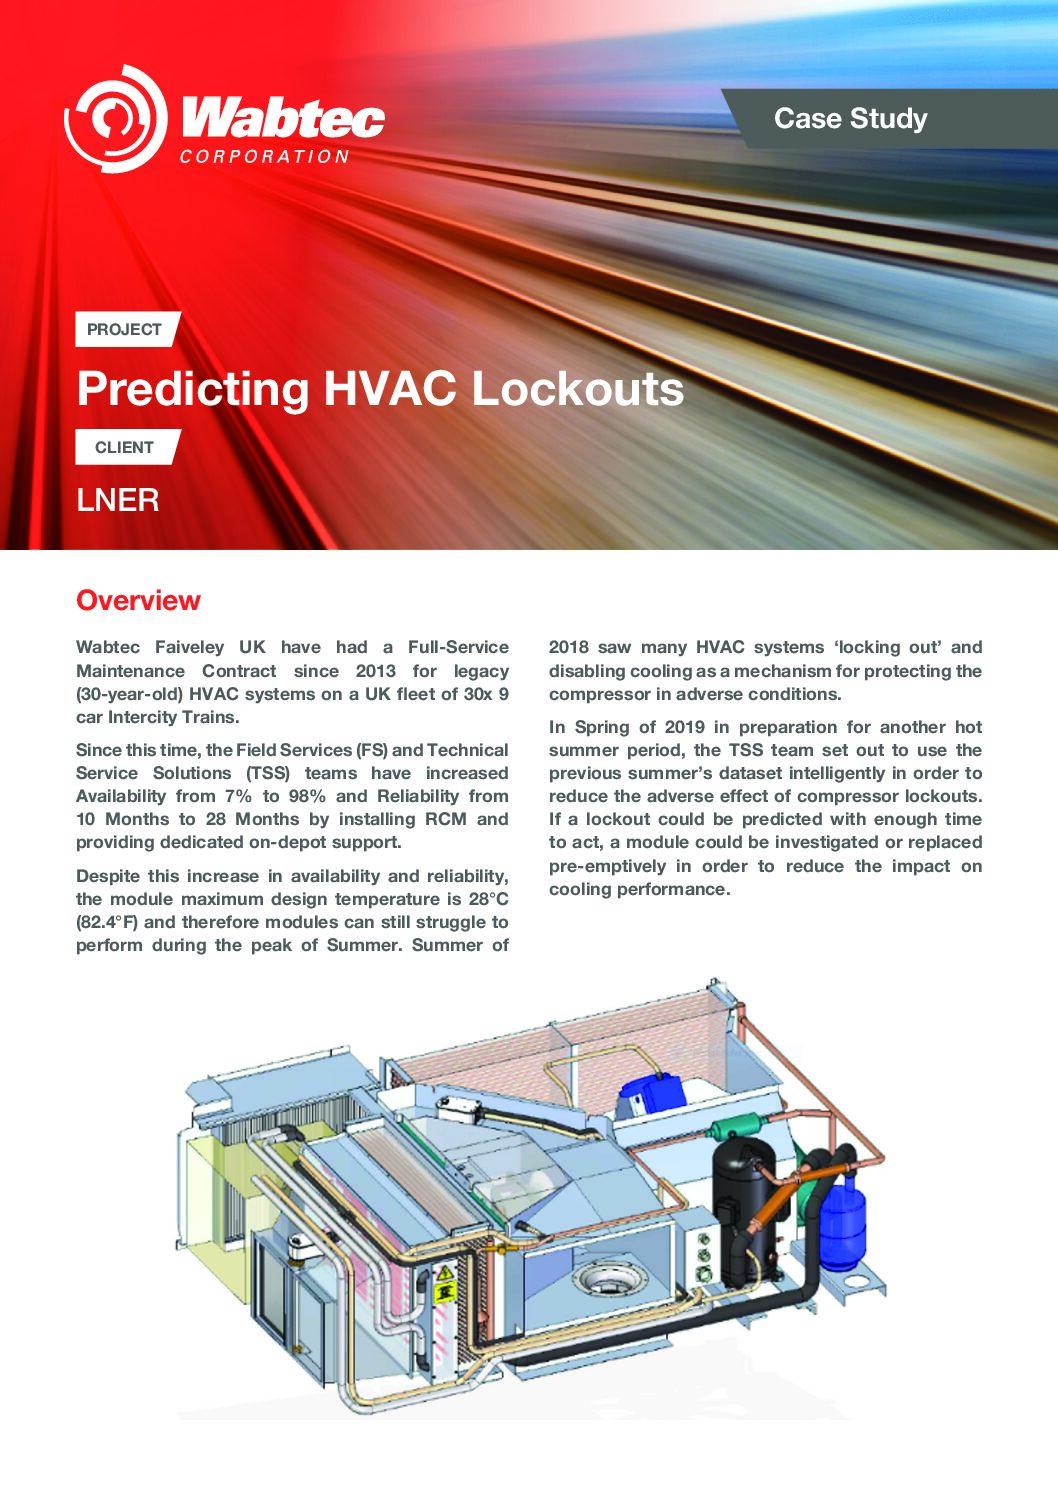 Wabtec HVAC Case Study